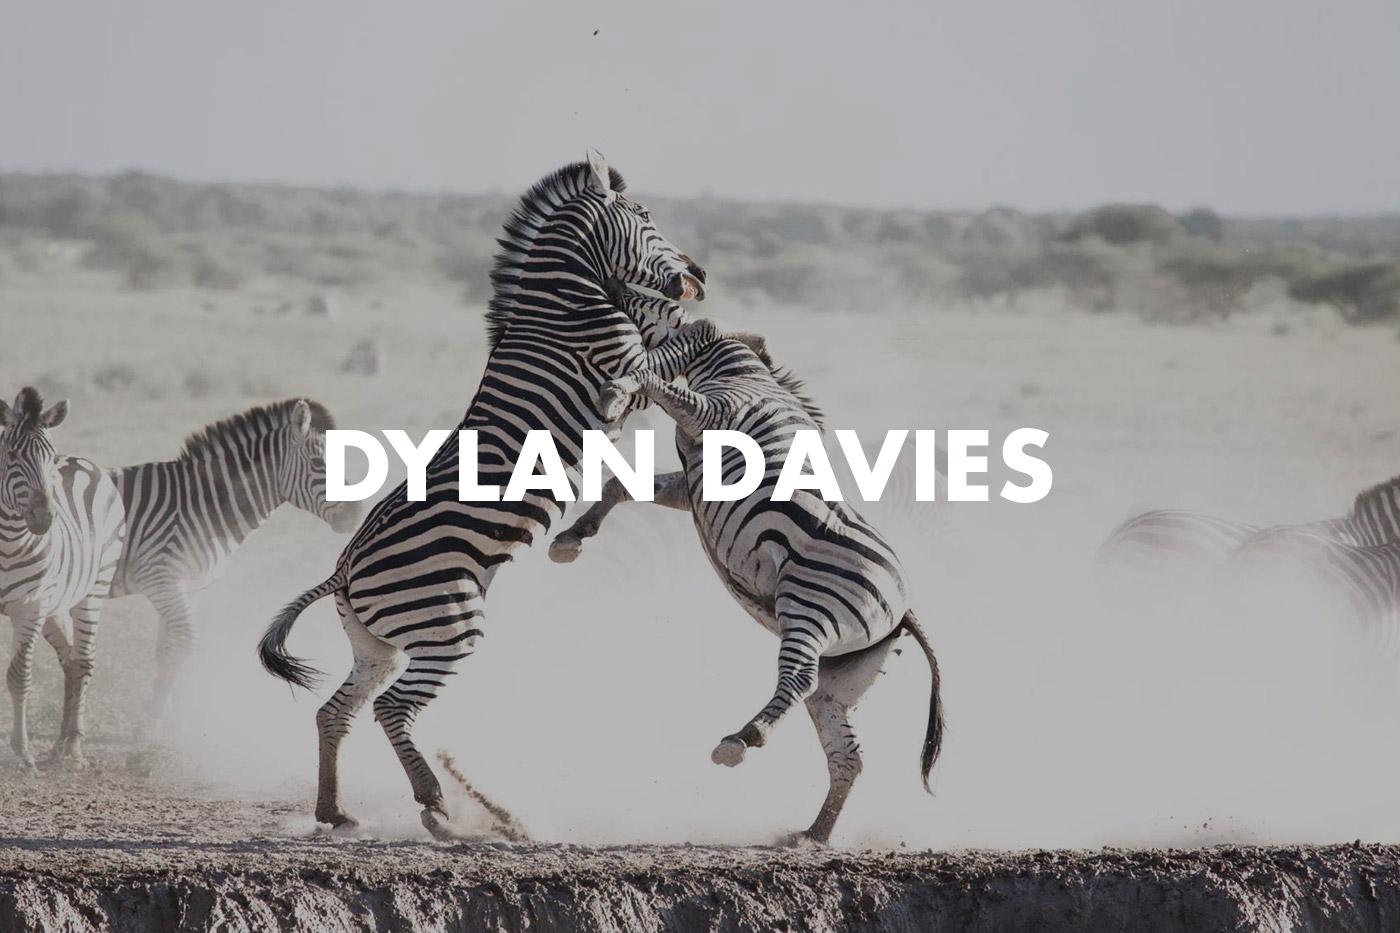 Dylan-Davies-Hero.jpg